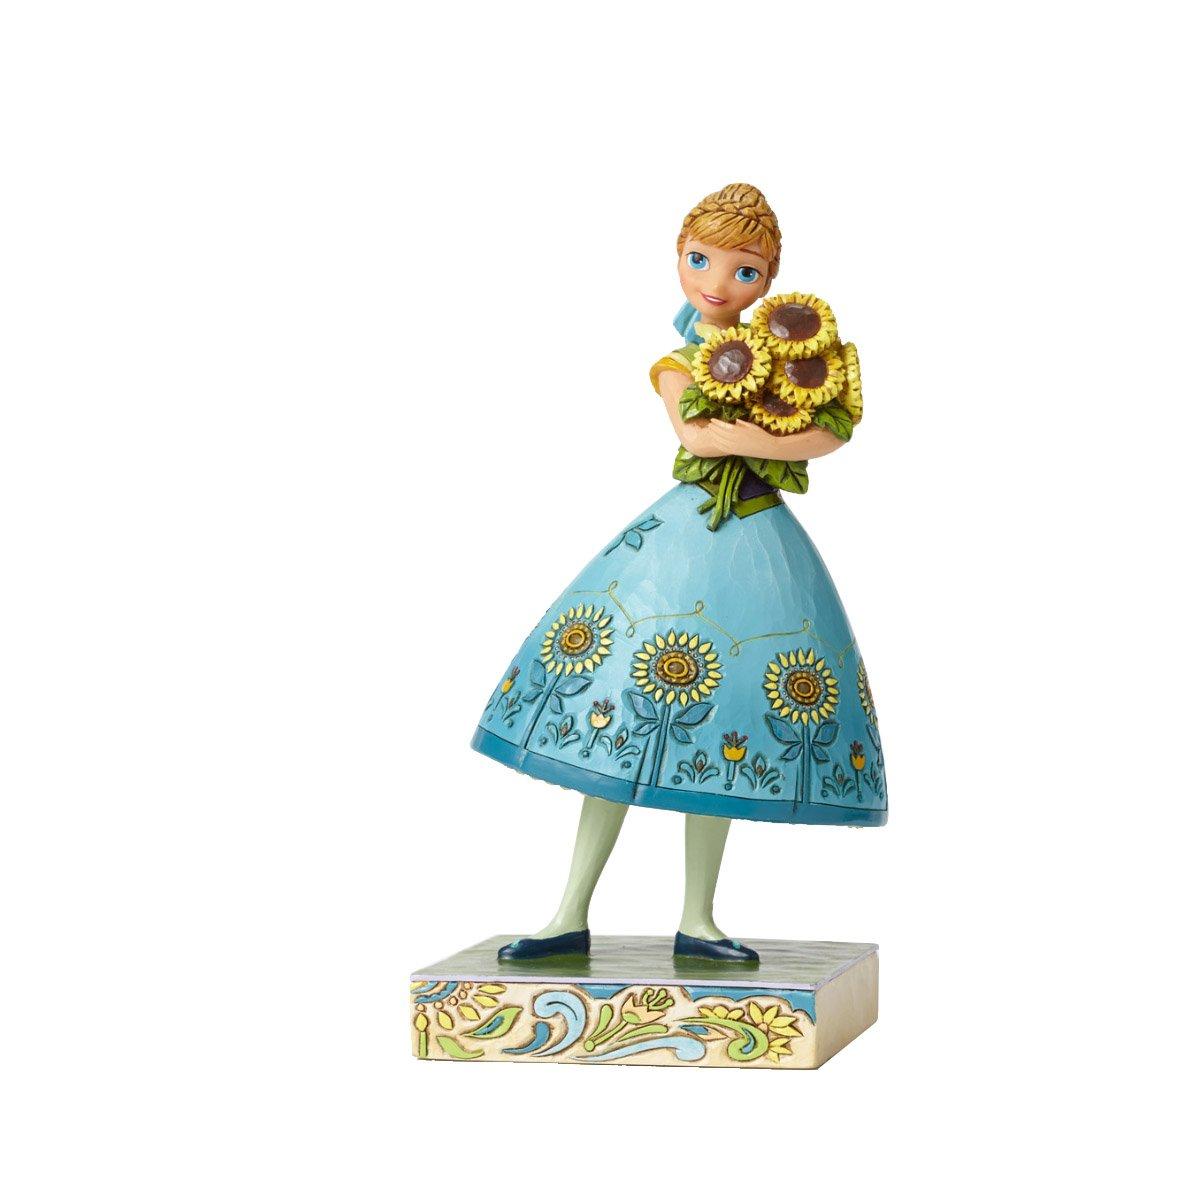 Enesco 4050882 Disney Traditions Frozen Fever Princess Anna Figurine Sunflowers